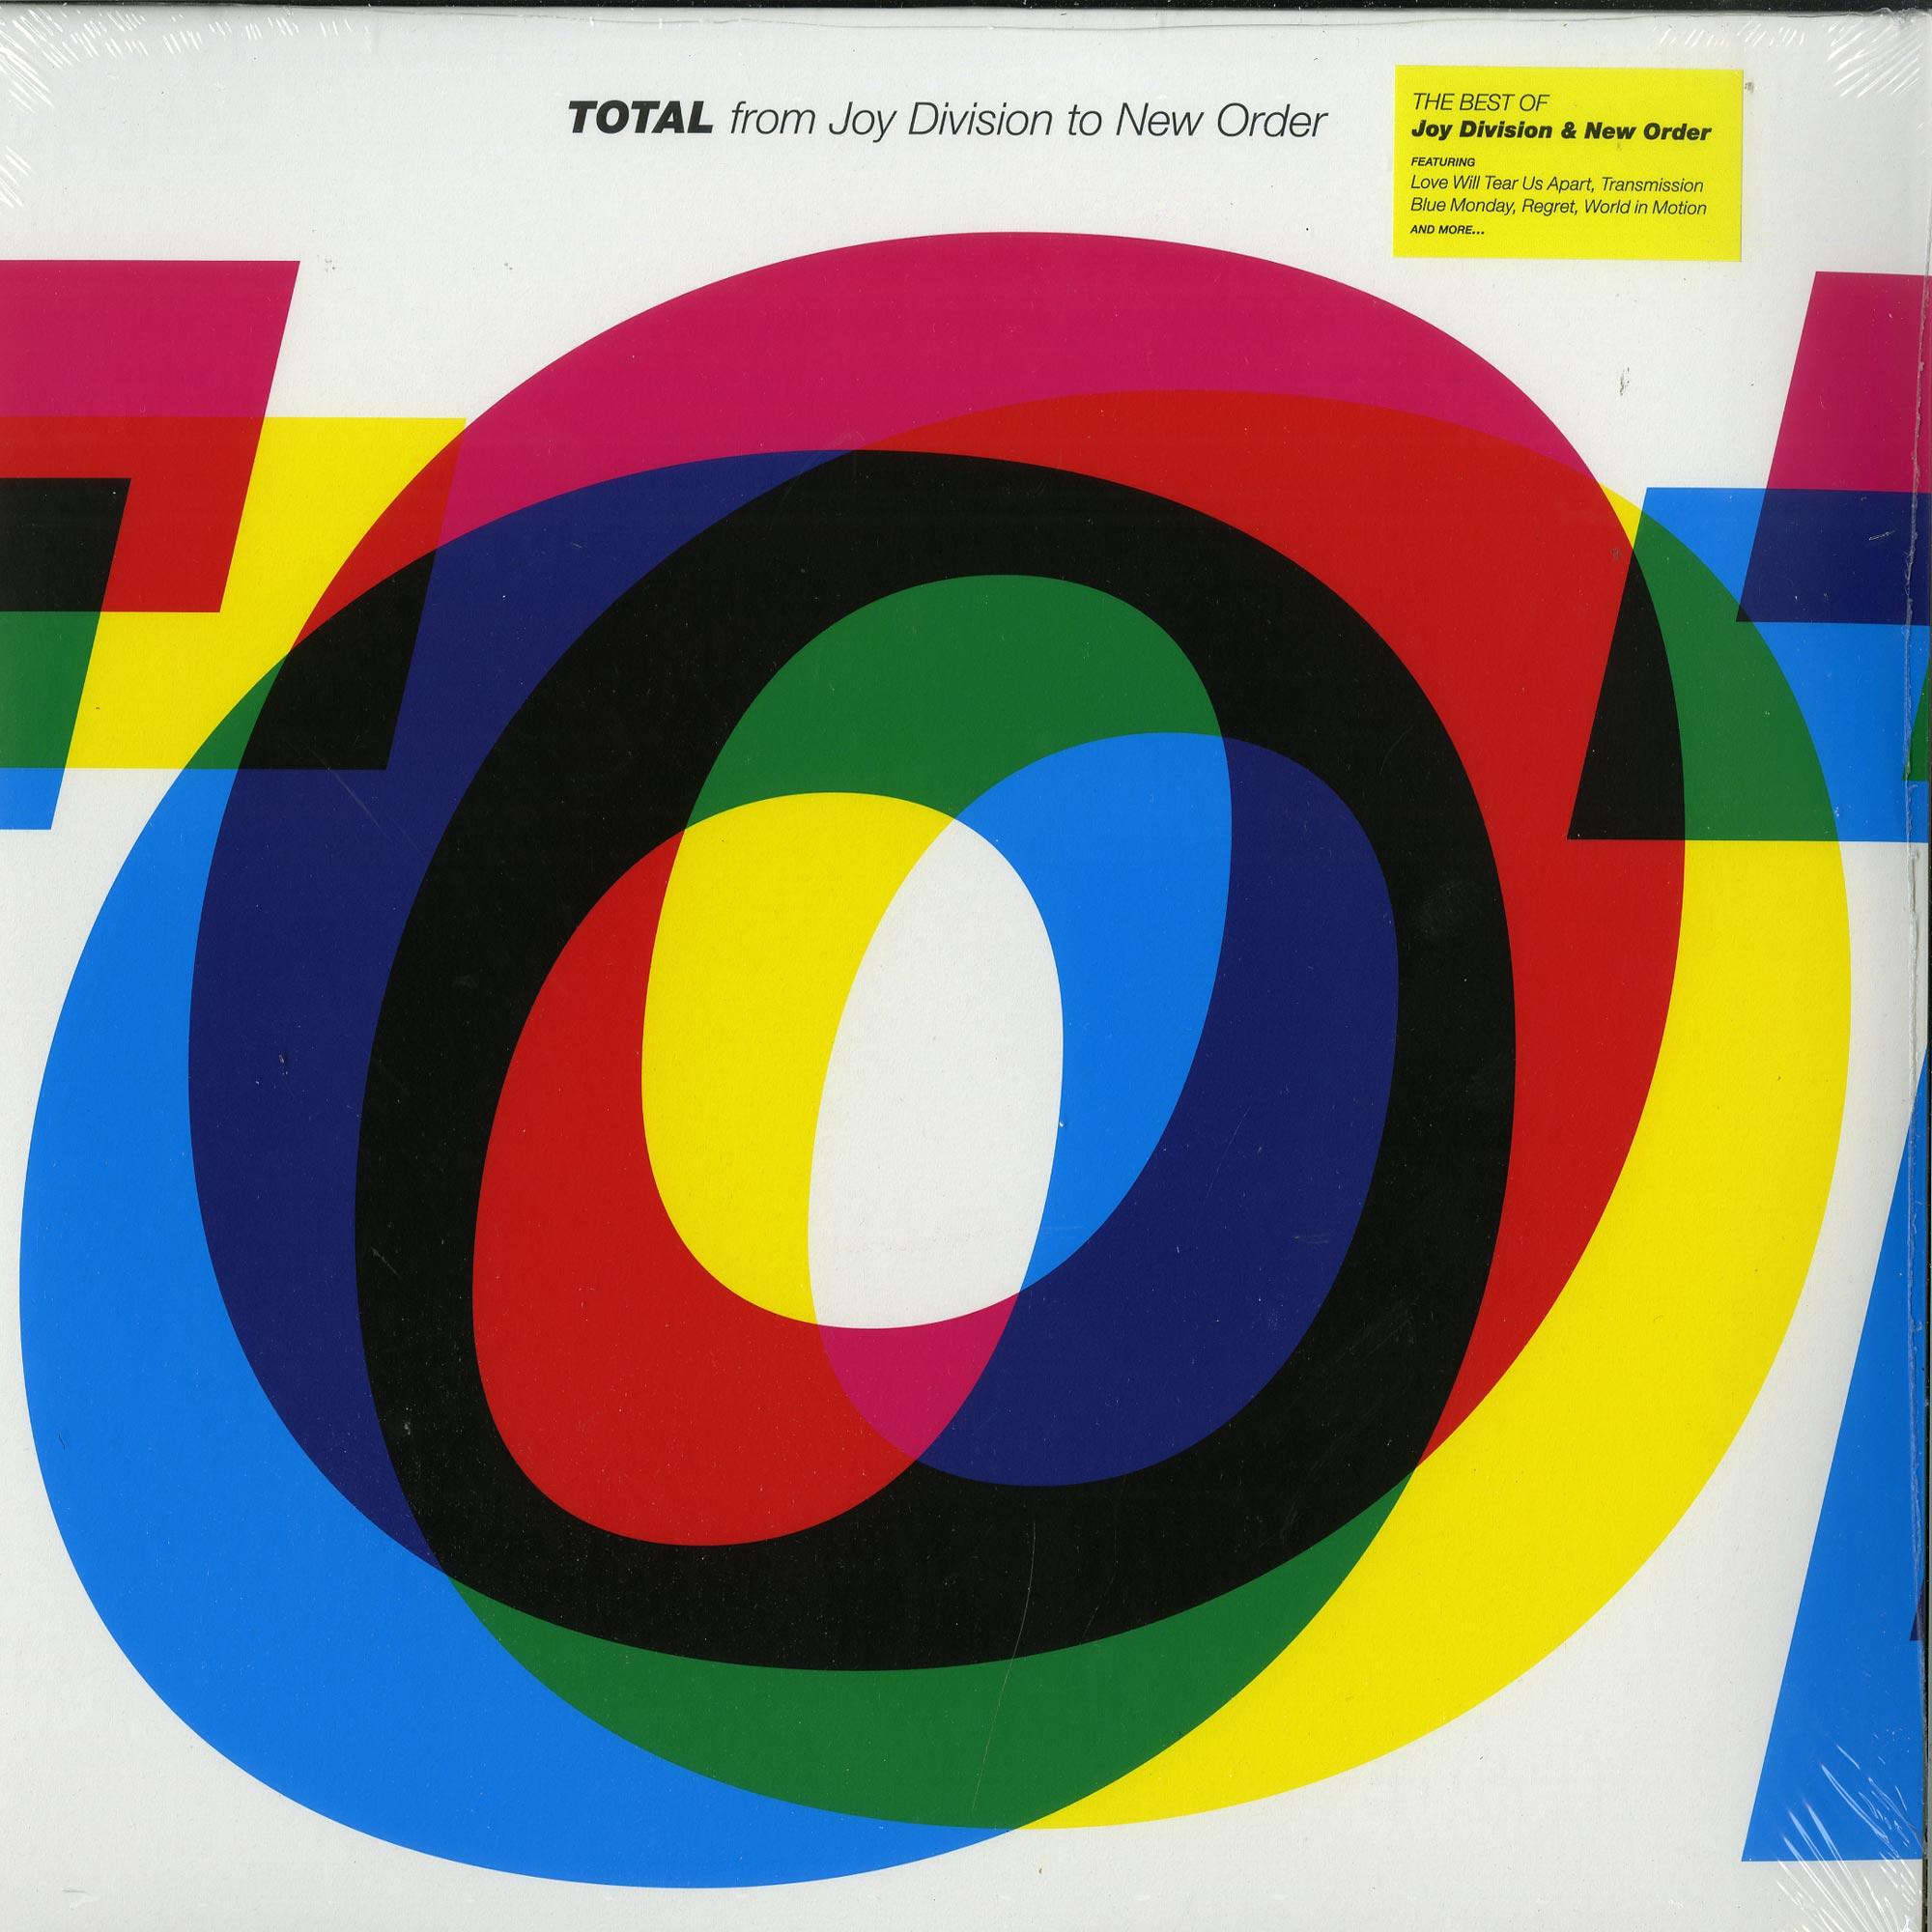 New Order & Joy Division - TOTAL